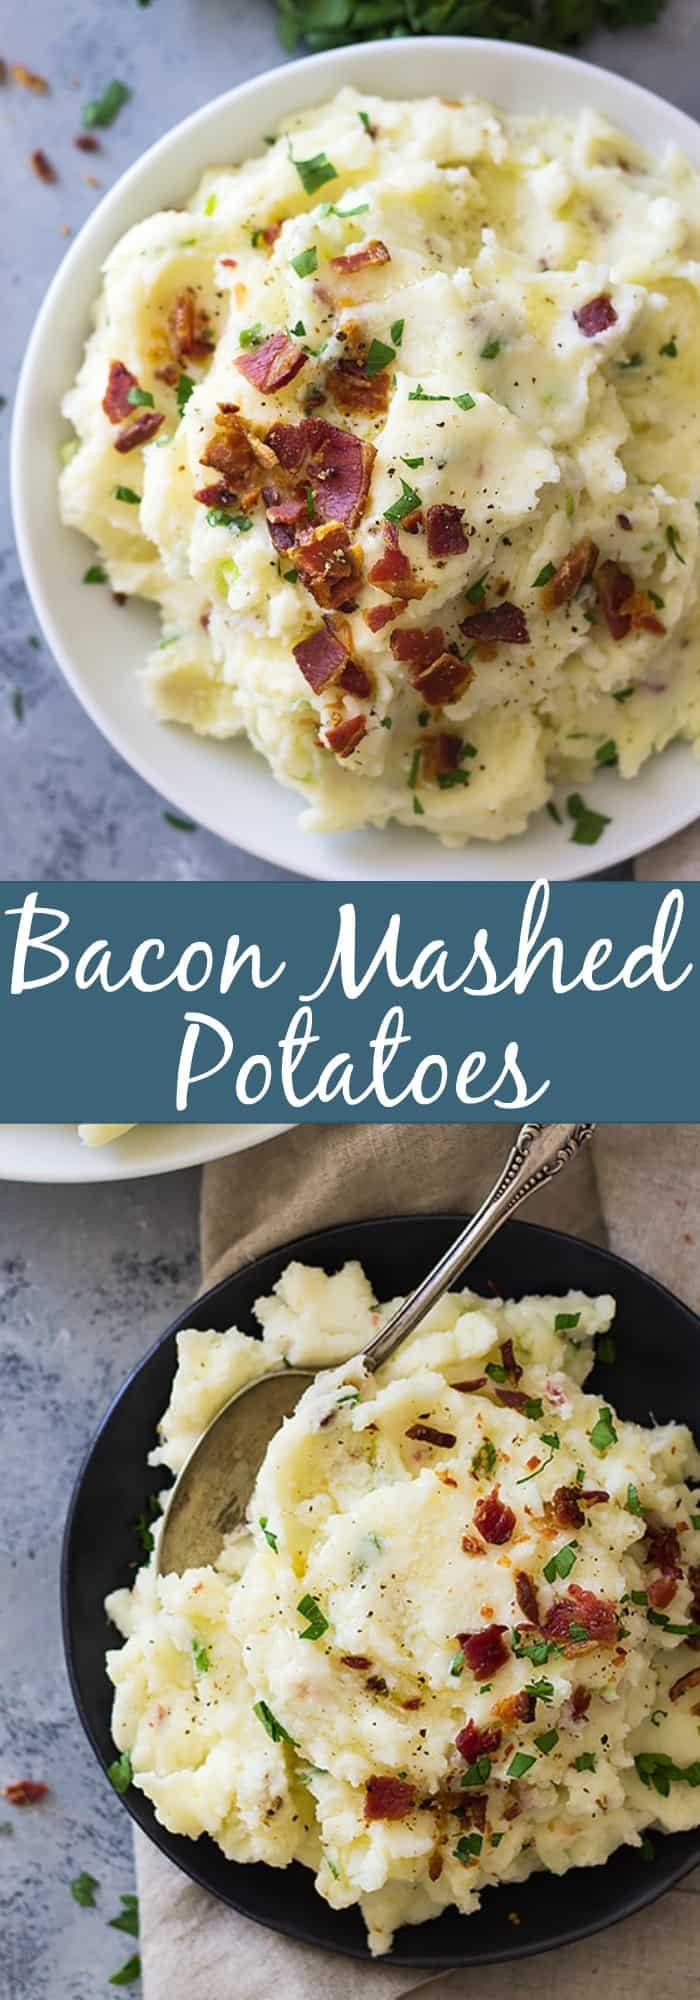 Bacon Mashed Potatoes  Bacon Mashed Potatoes